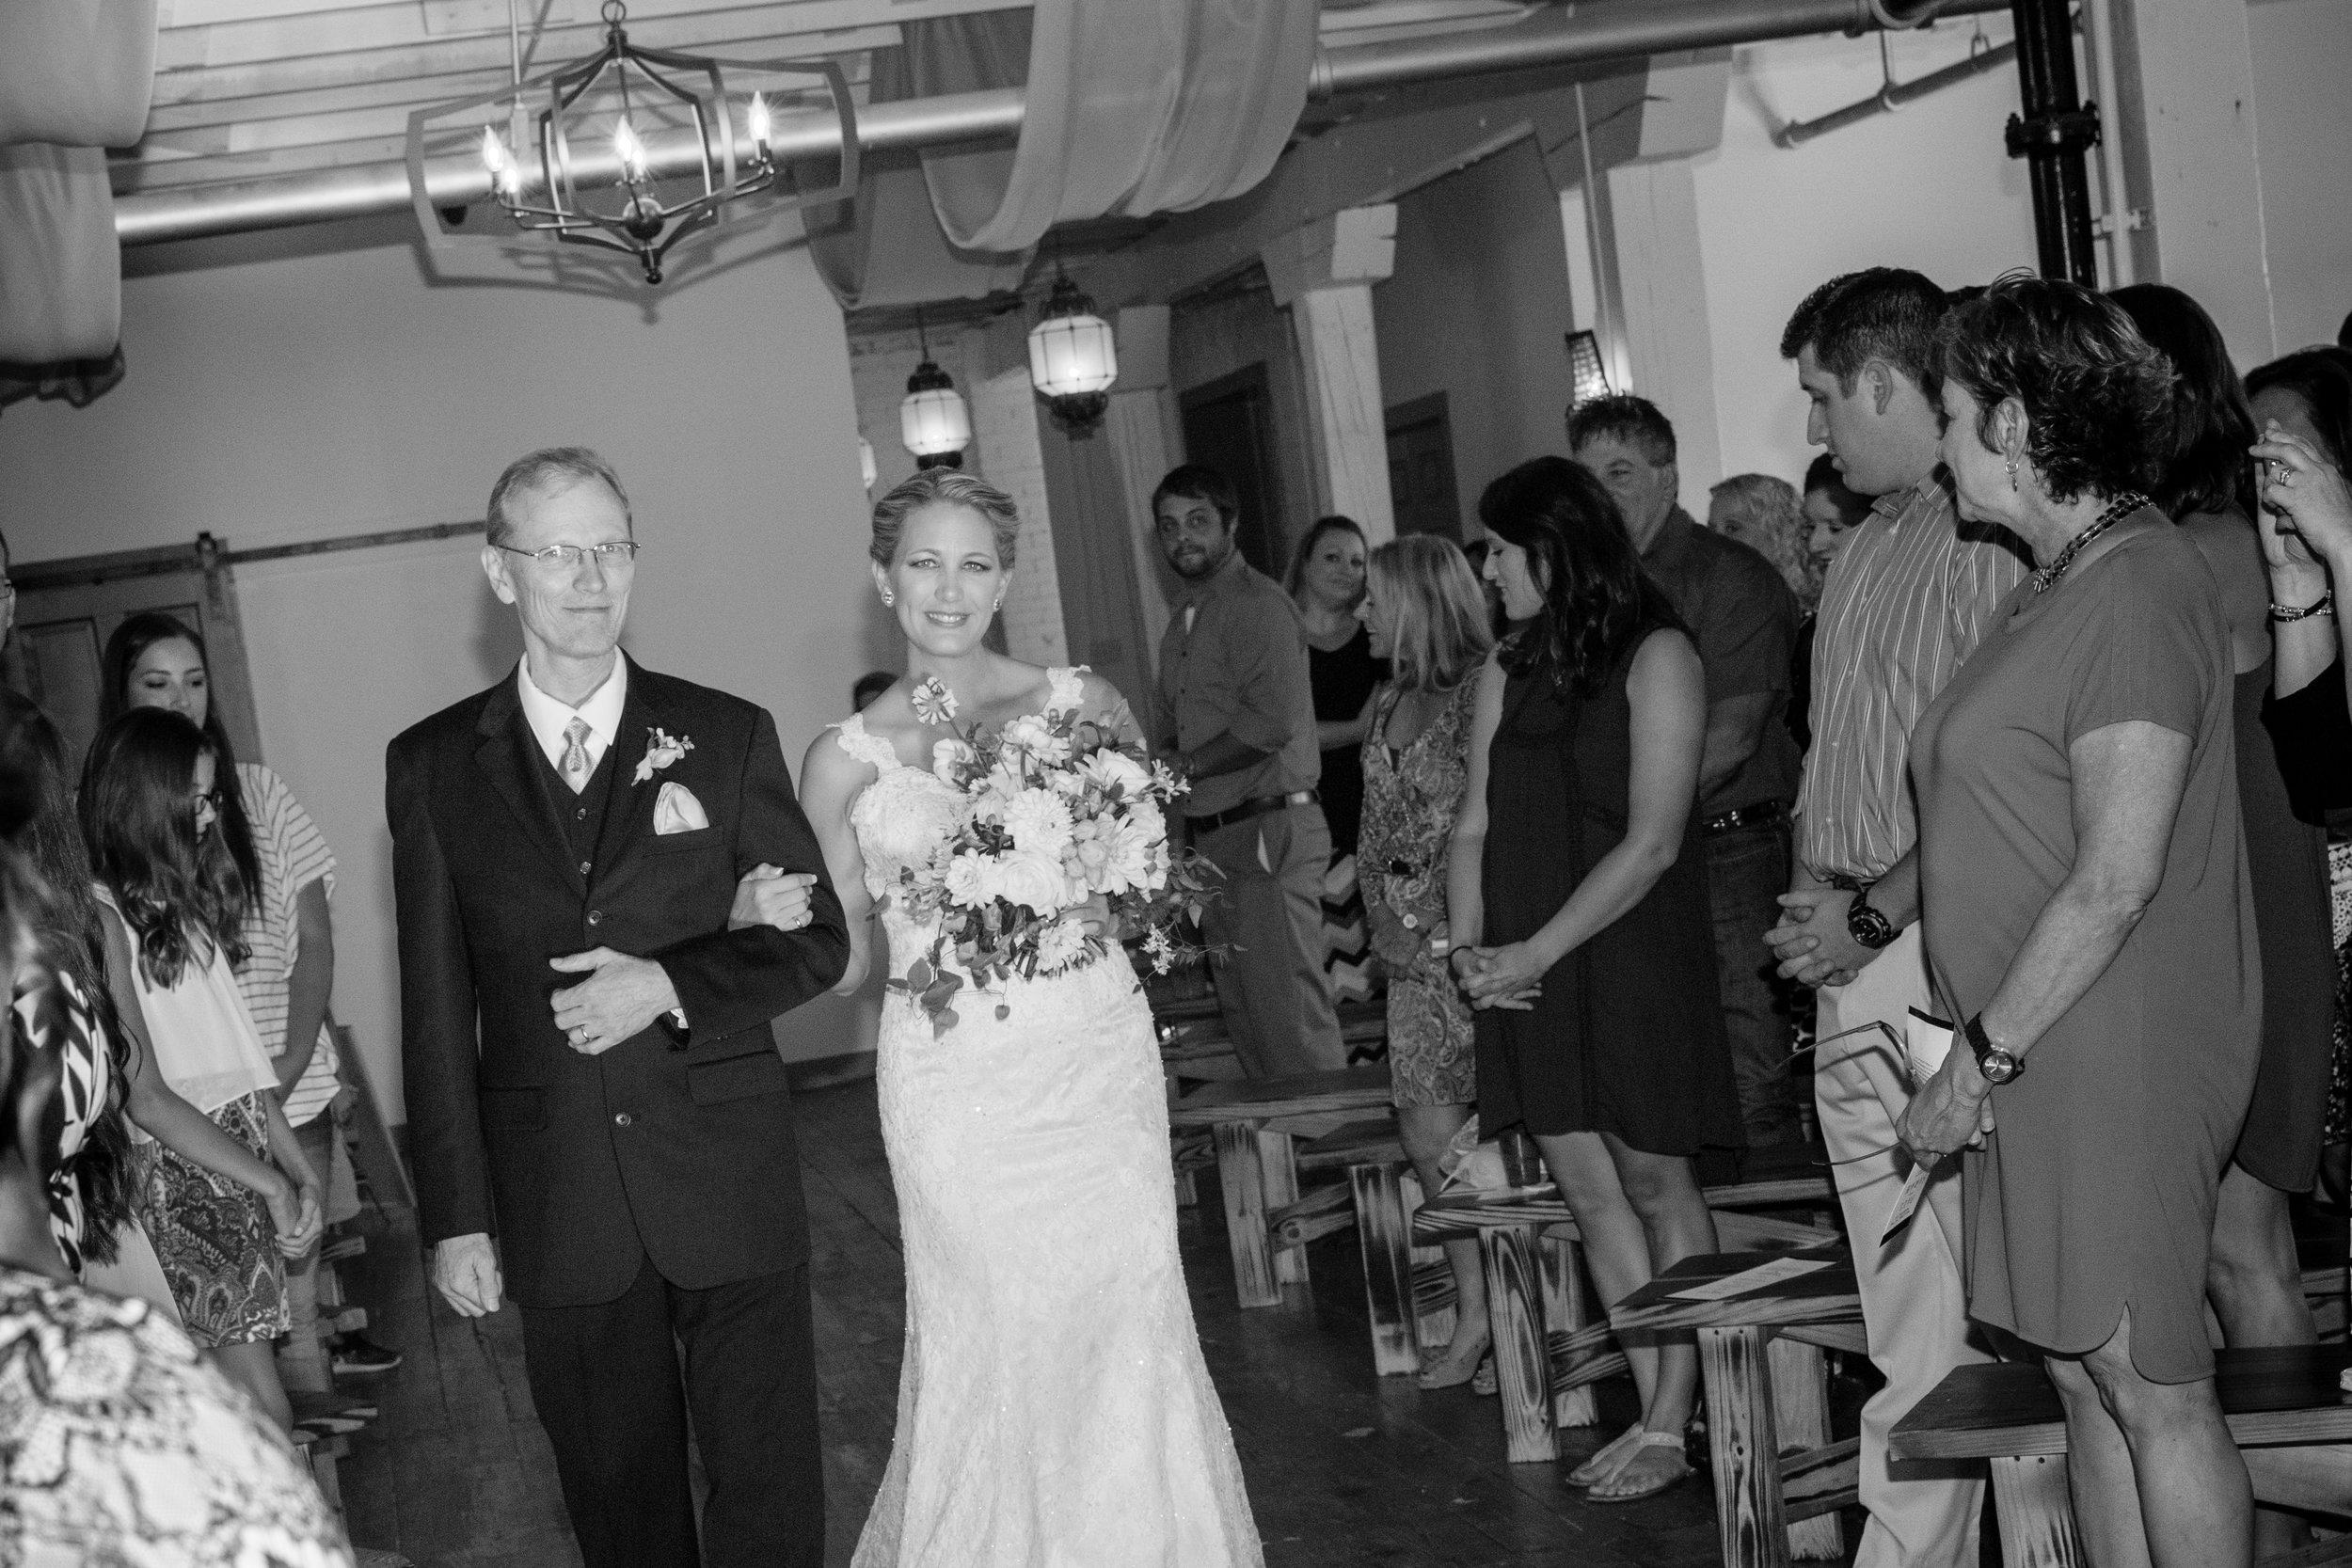 FT_Worths_Wedding_Venue_Brik.jpg